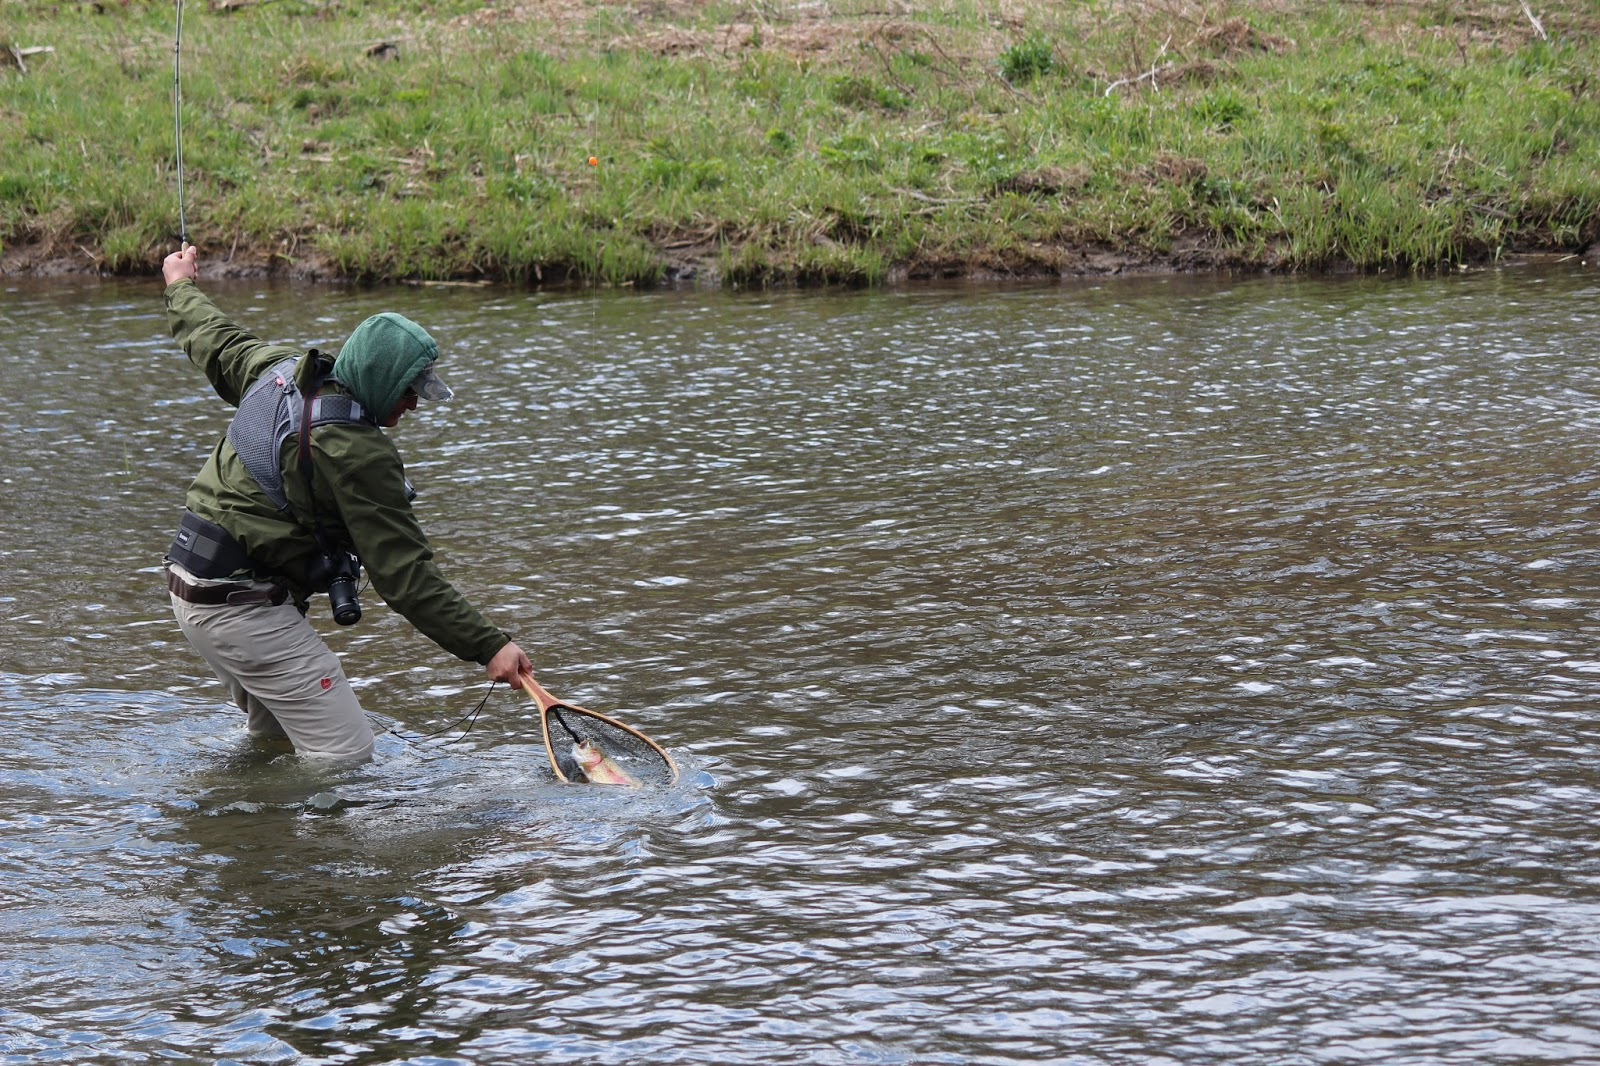 Wny fly fishing wny fly fishing stream report 4 23 2016 for Fly fishing blog